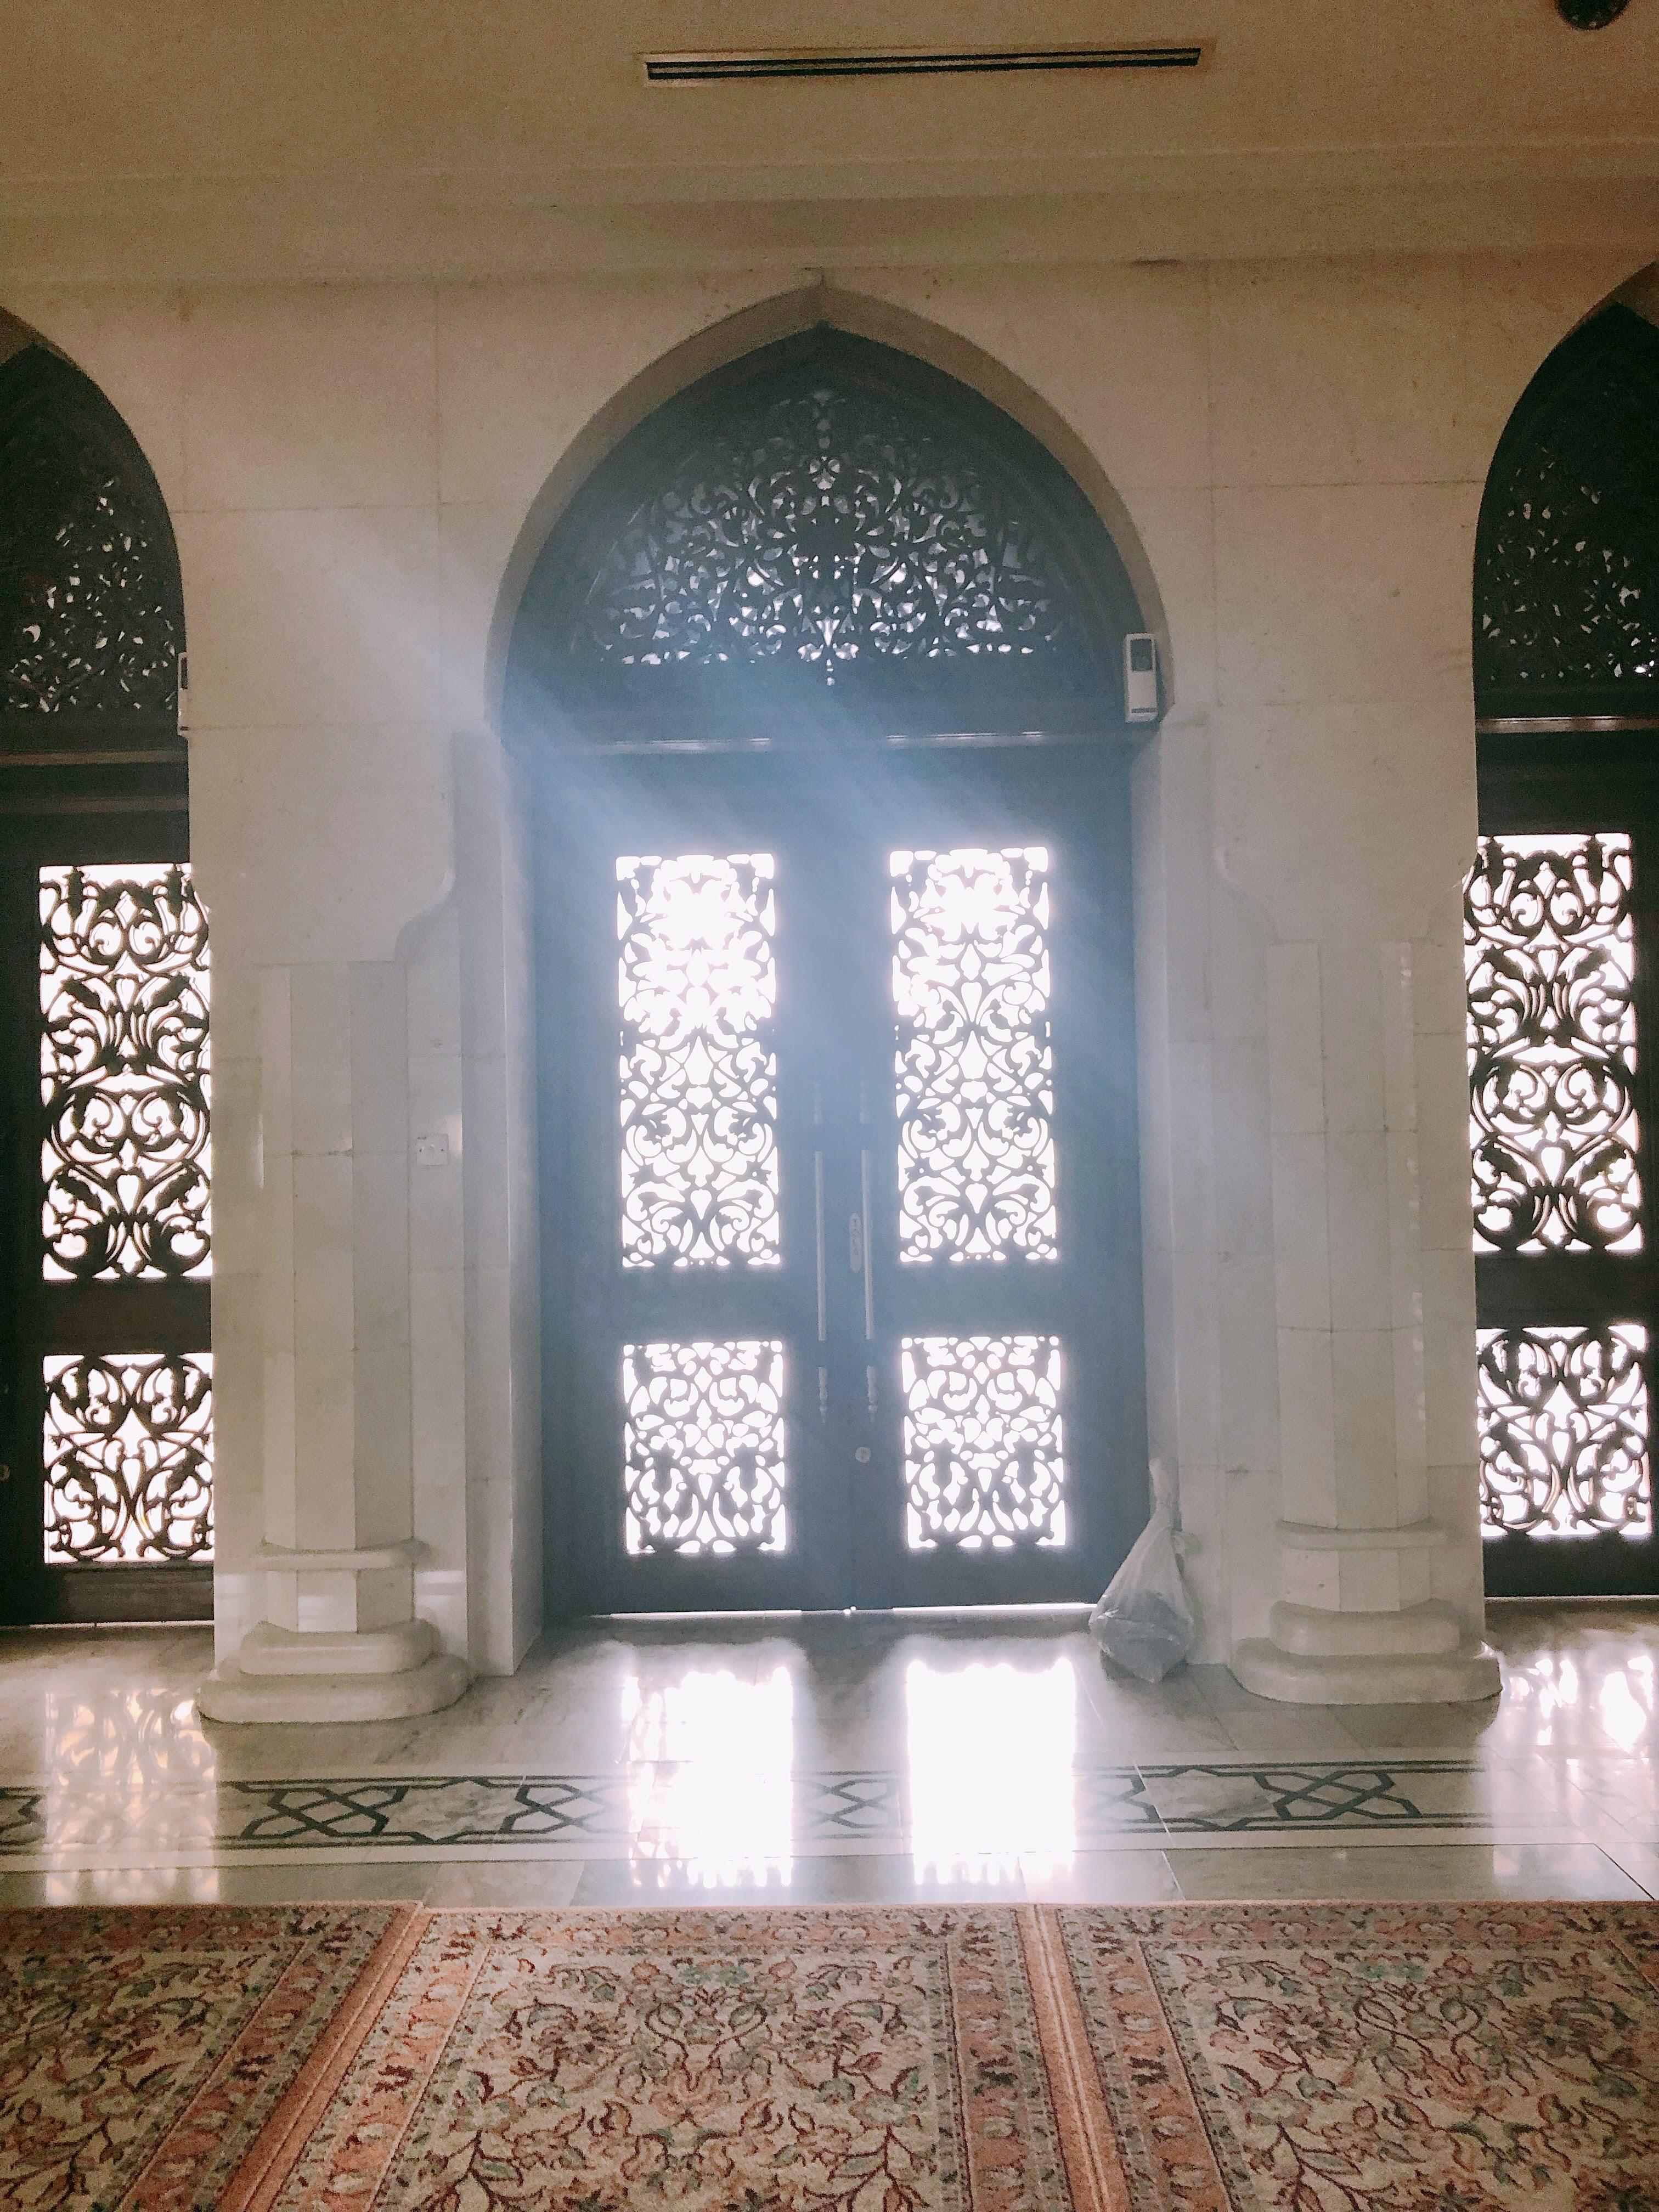 "Malaysia_MasjidWilayahPersekutuan_Mainhall_017"""""